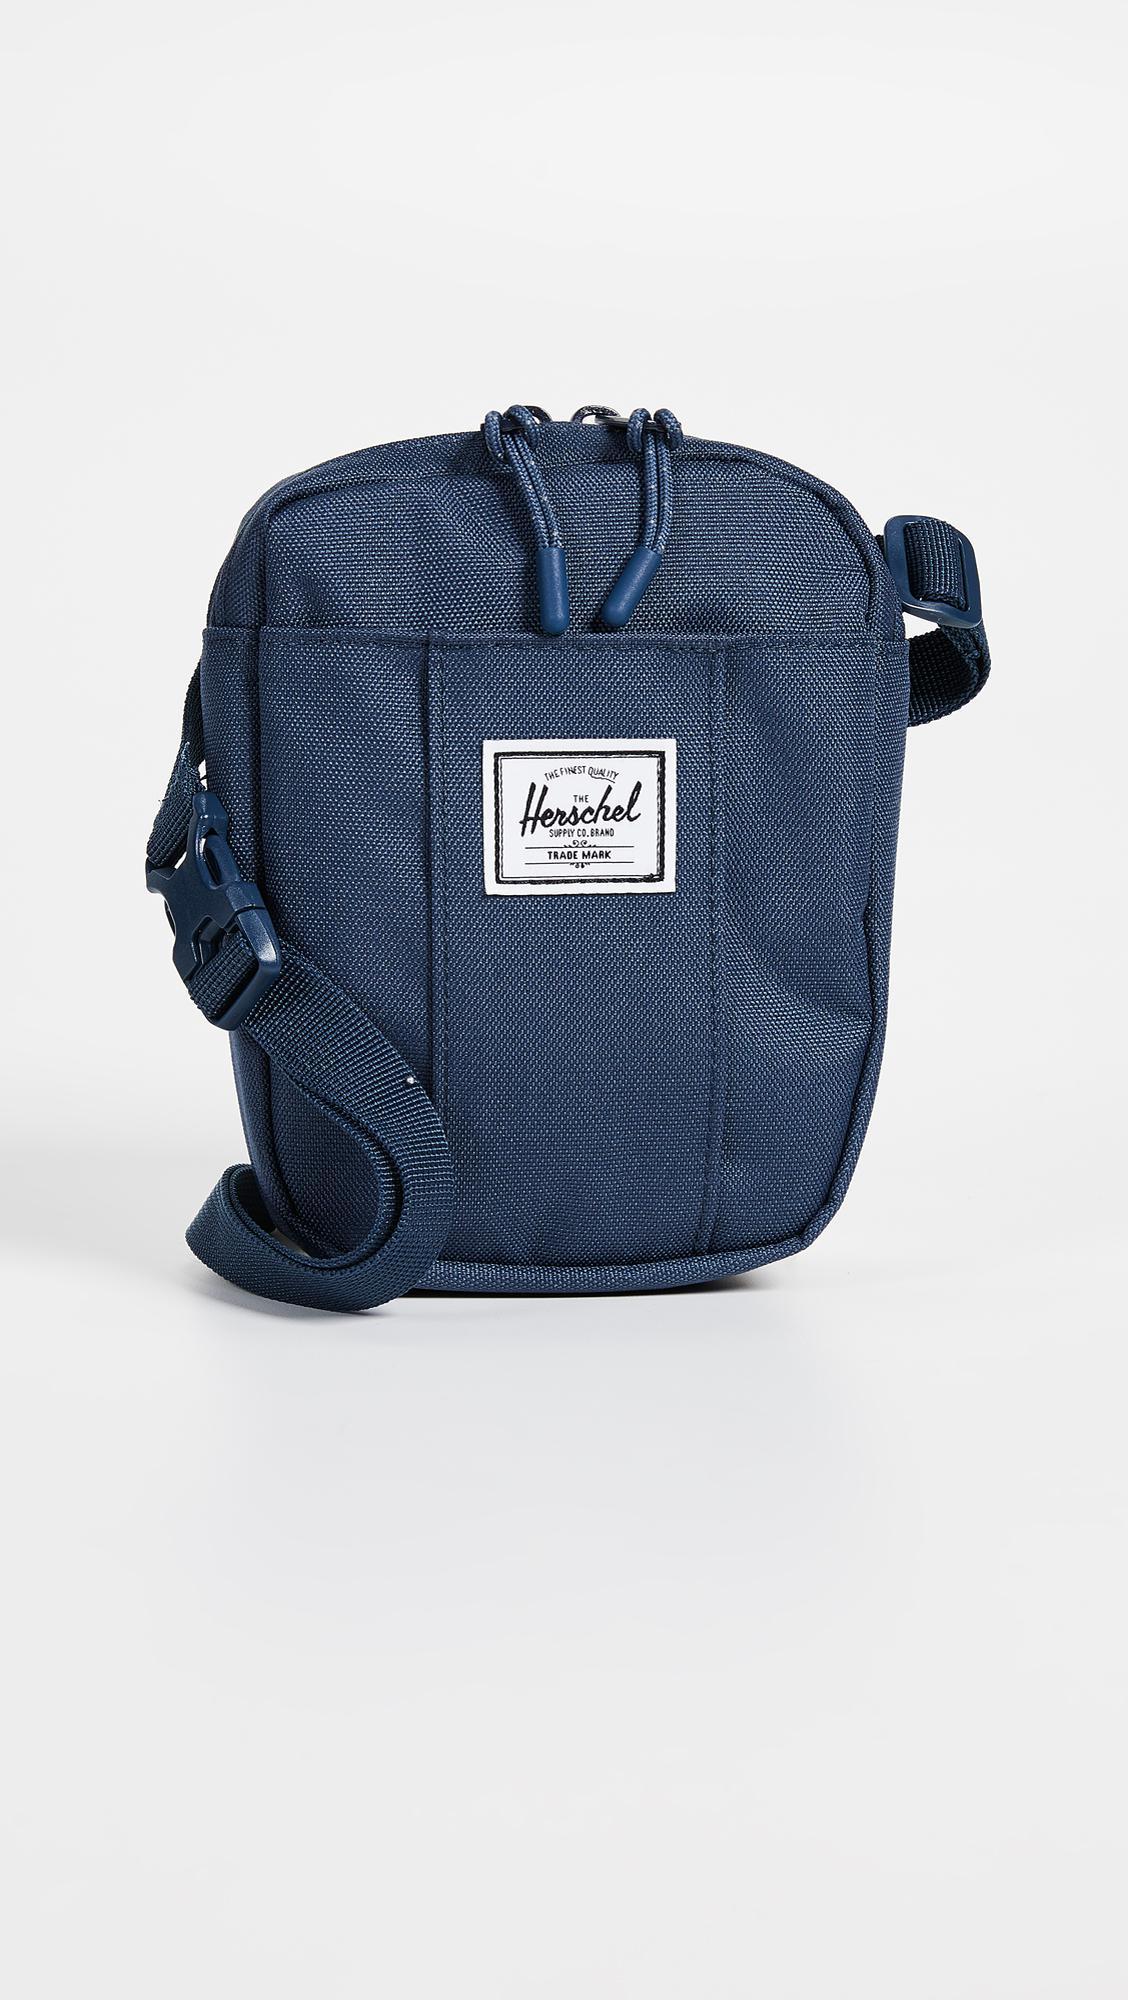 1dcad82b2e Herschel Supply Co. Cruz Hip Pack in Blue - Lyst